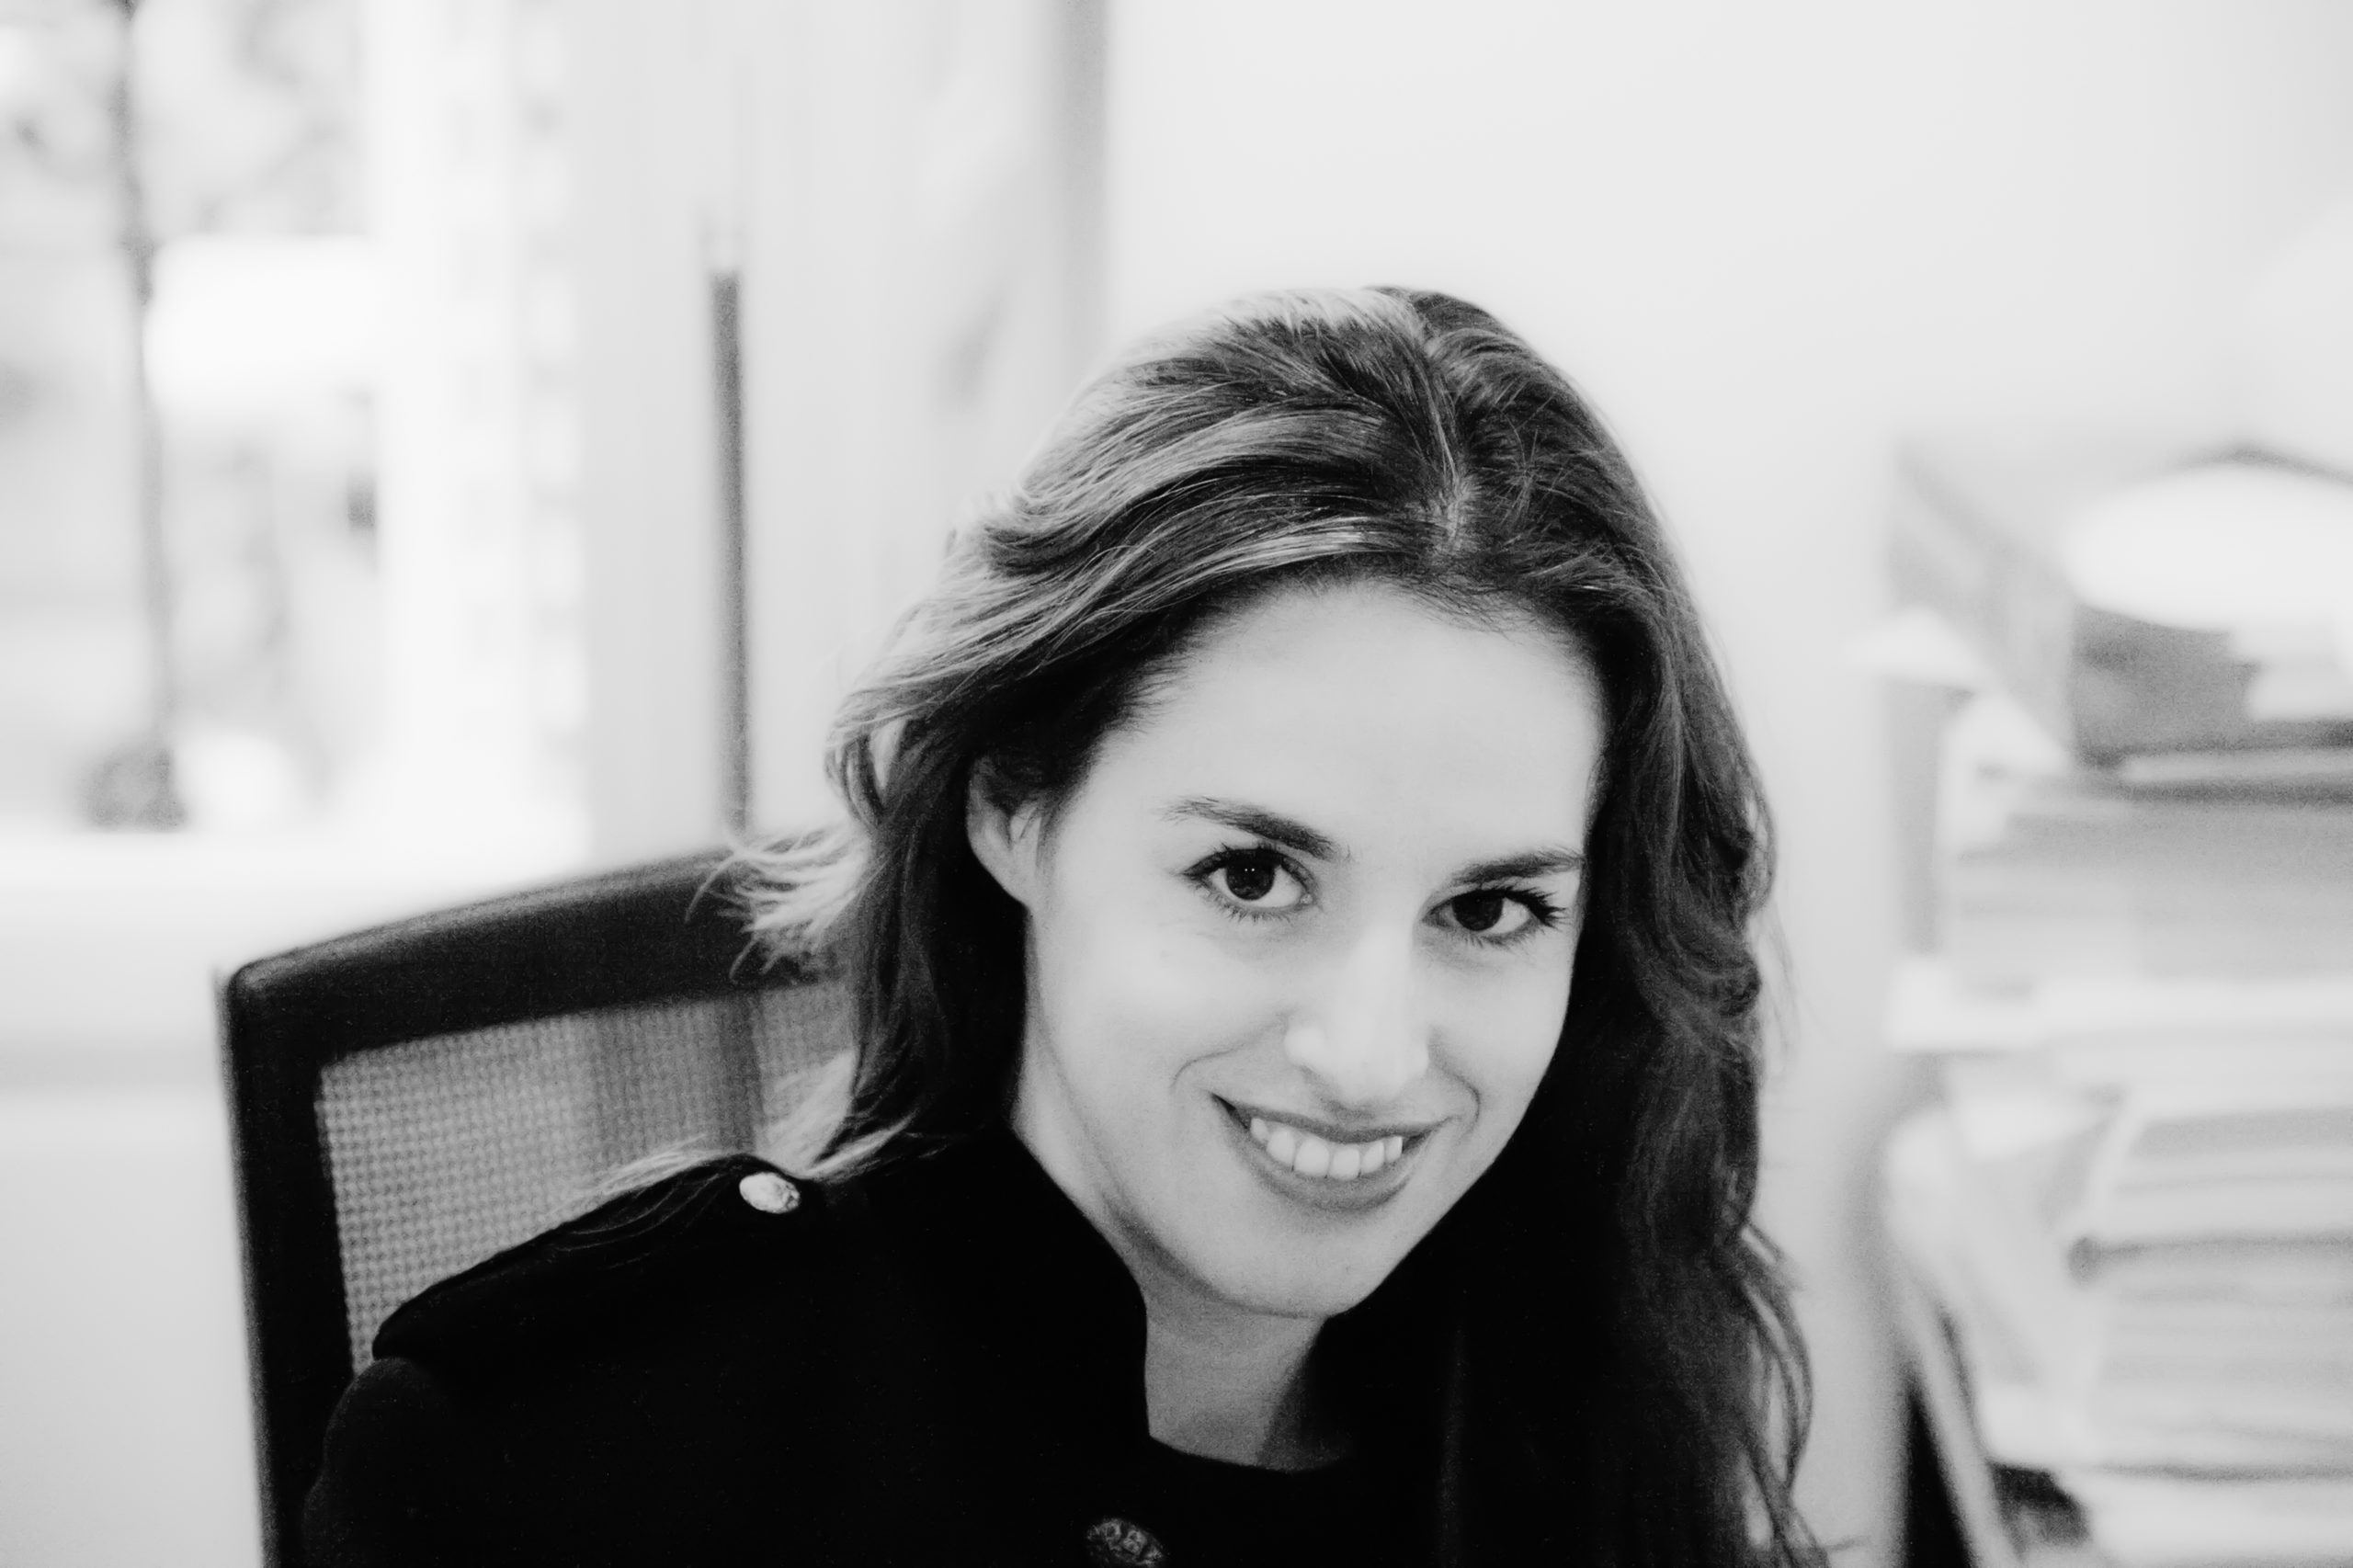 Carmen Gutiérrez Dorronsoro